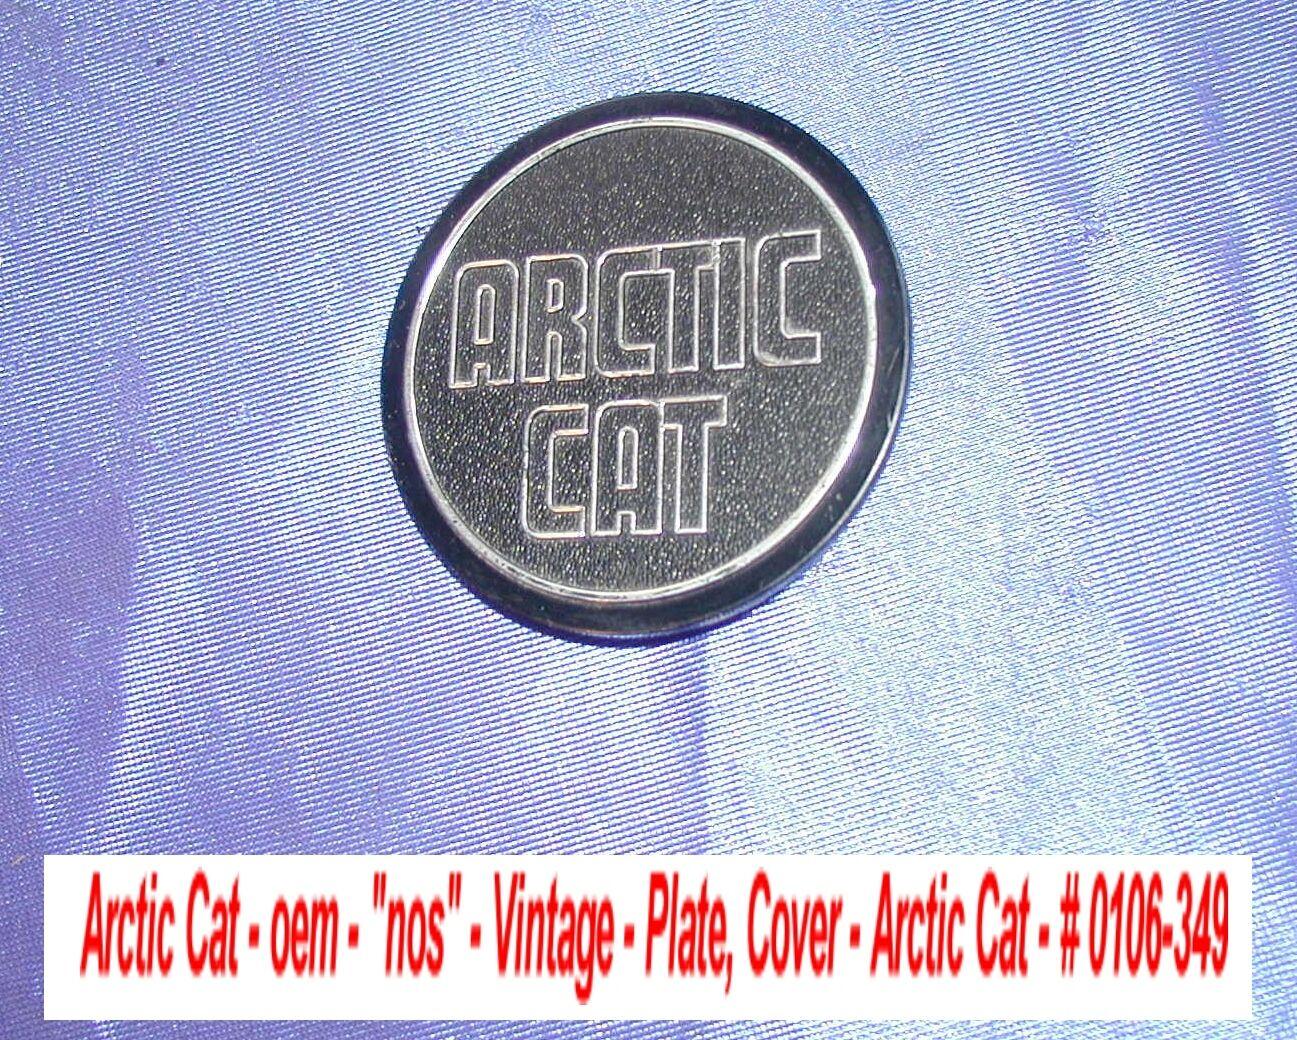 Arctic Cat oem Plate, Cover-Arctic Cat, Console Hood  Vintage